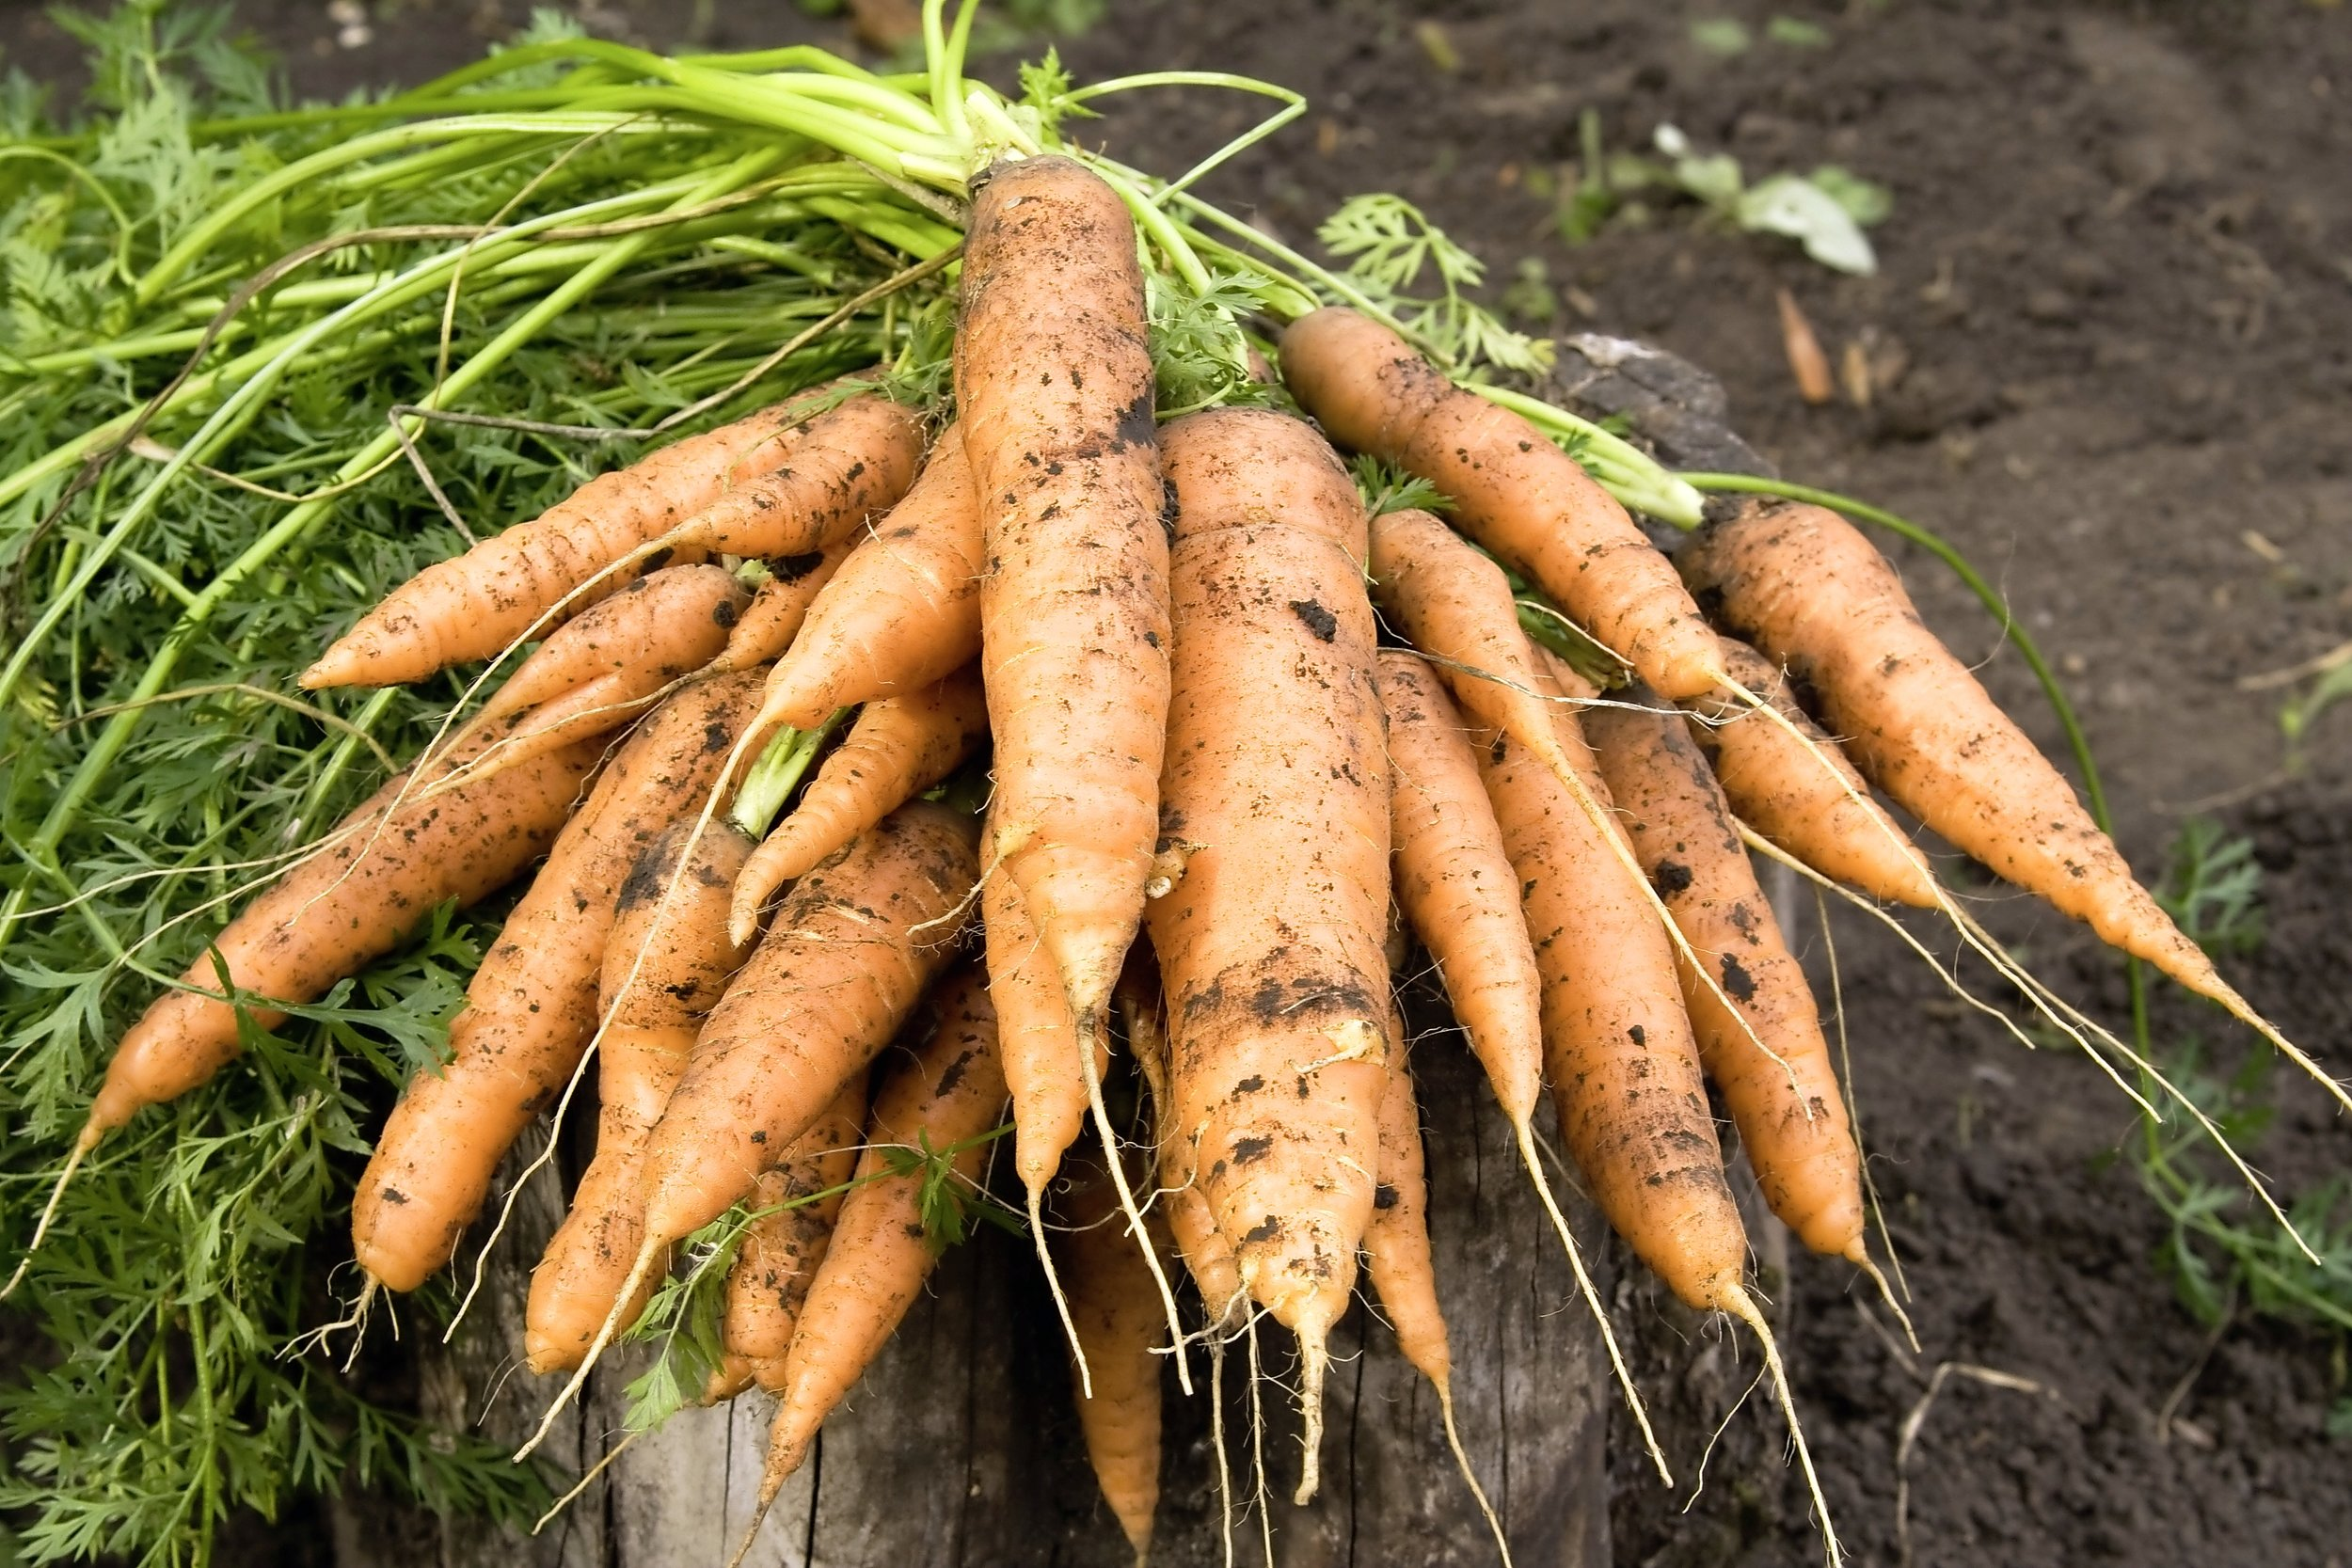 Root veg